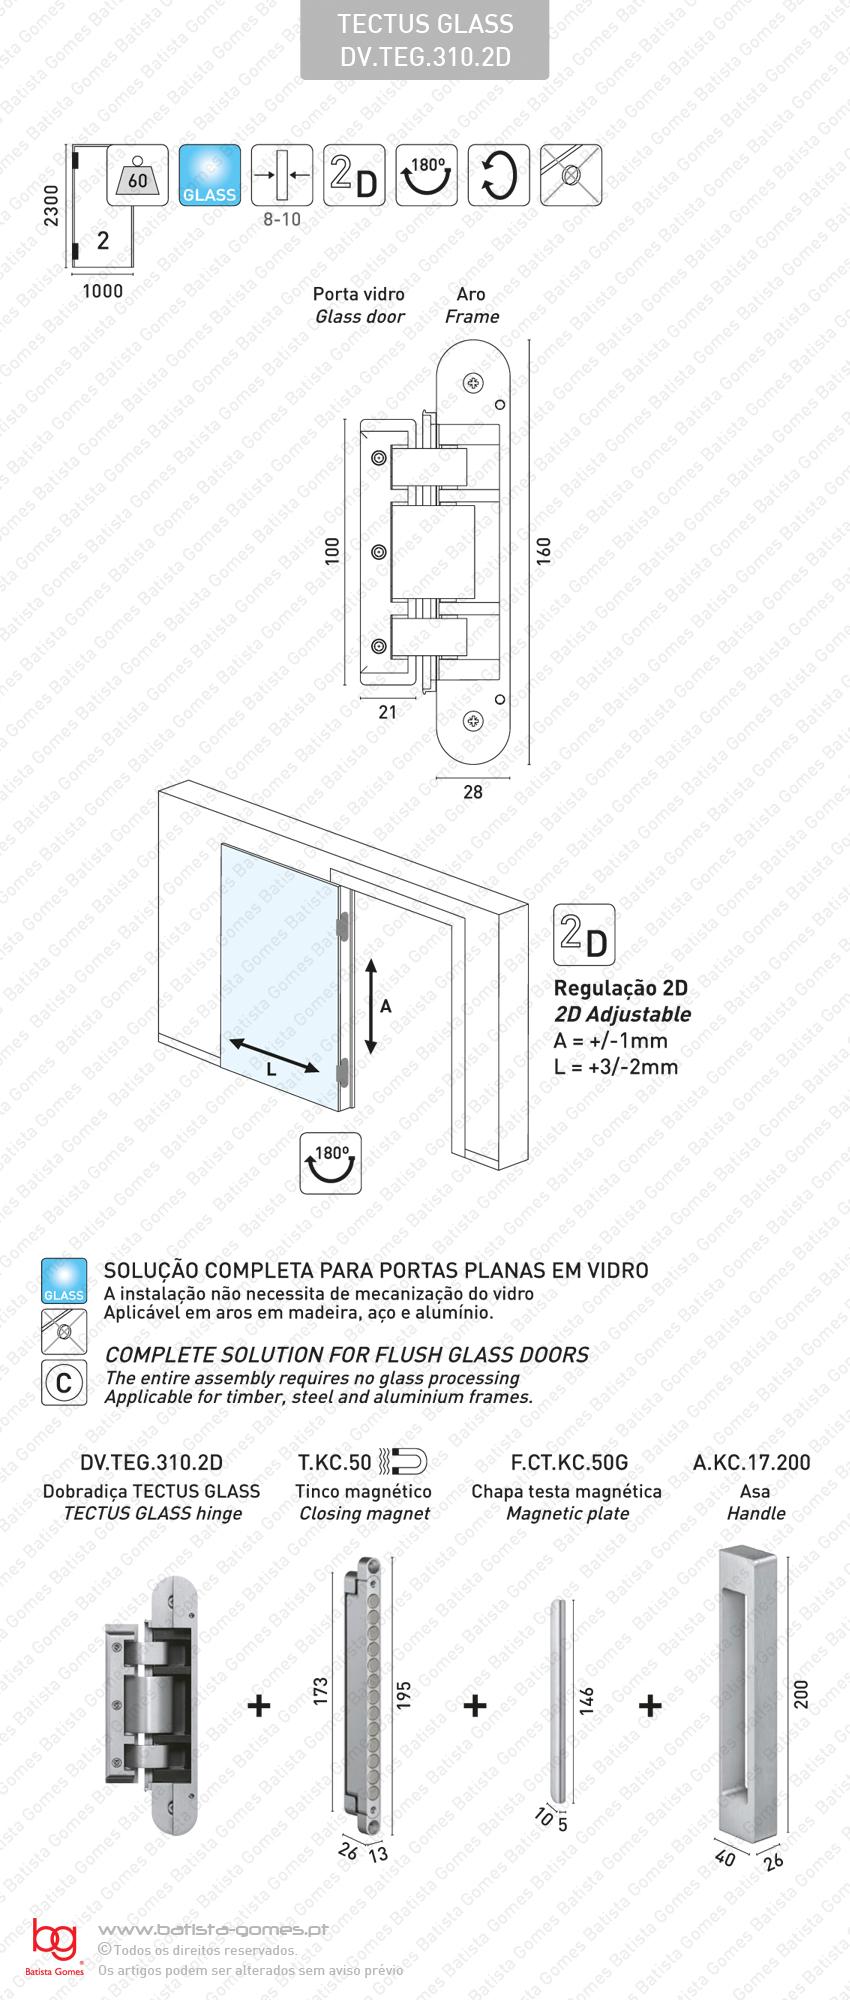 Dobradiça para vidro TECTUS GLASS 2 D - Carga 60Kgs (2 Dobradiças)